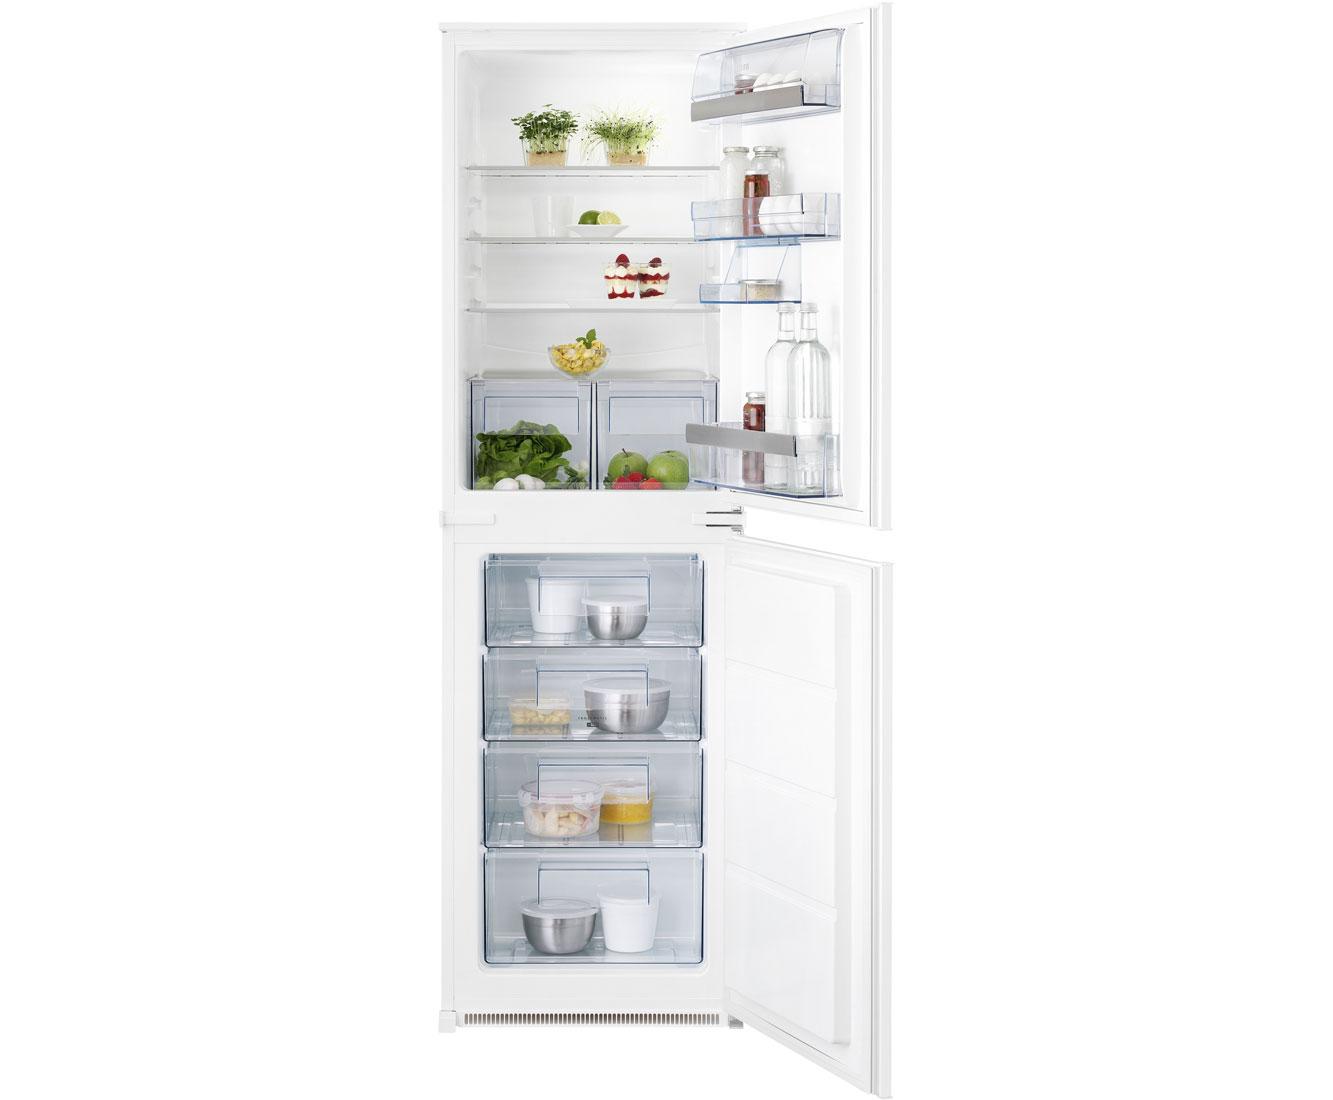 Aeg Kühlschrank Rkb64024dx : Aeg santo buy cheap aeg fridge freezer compare fridge freezers